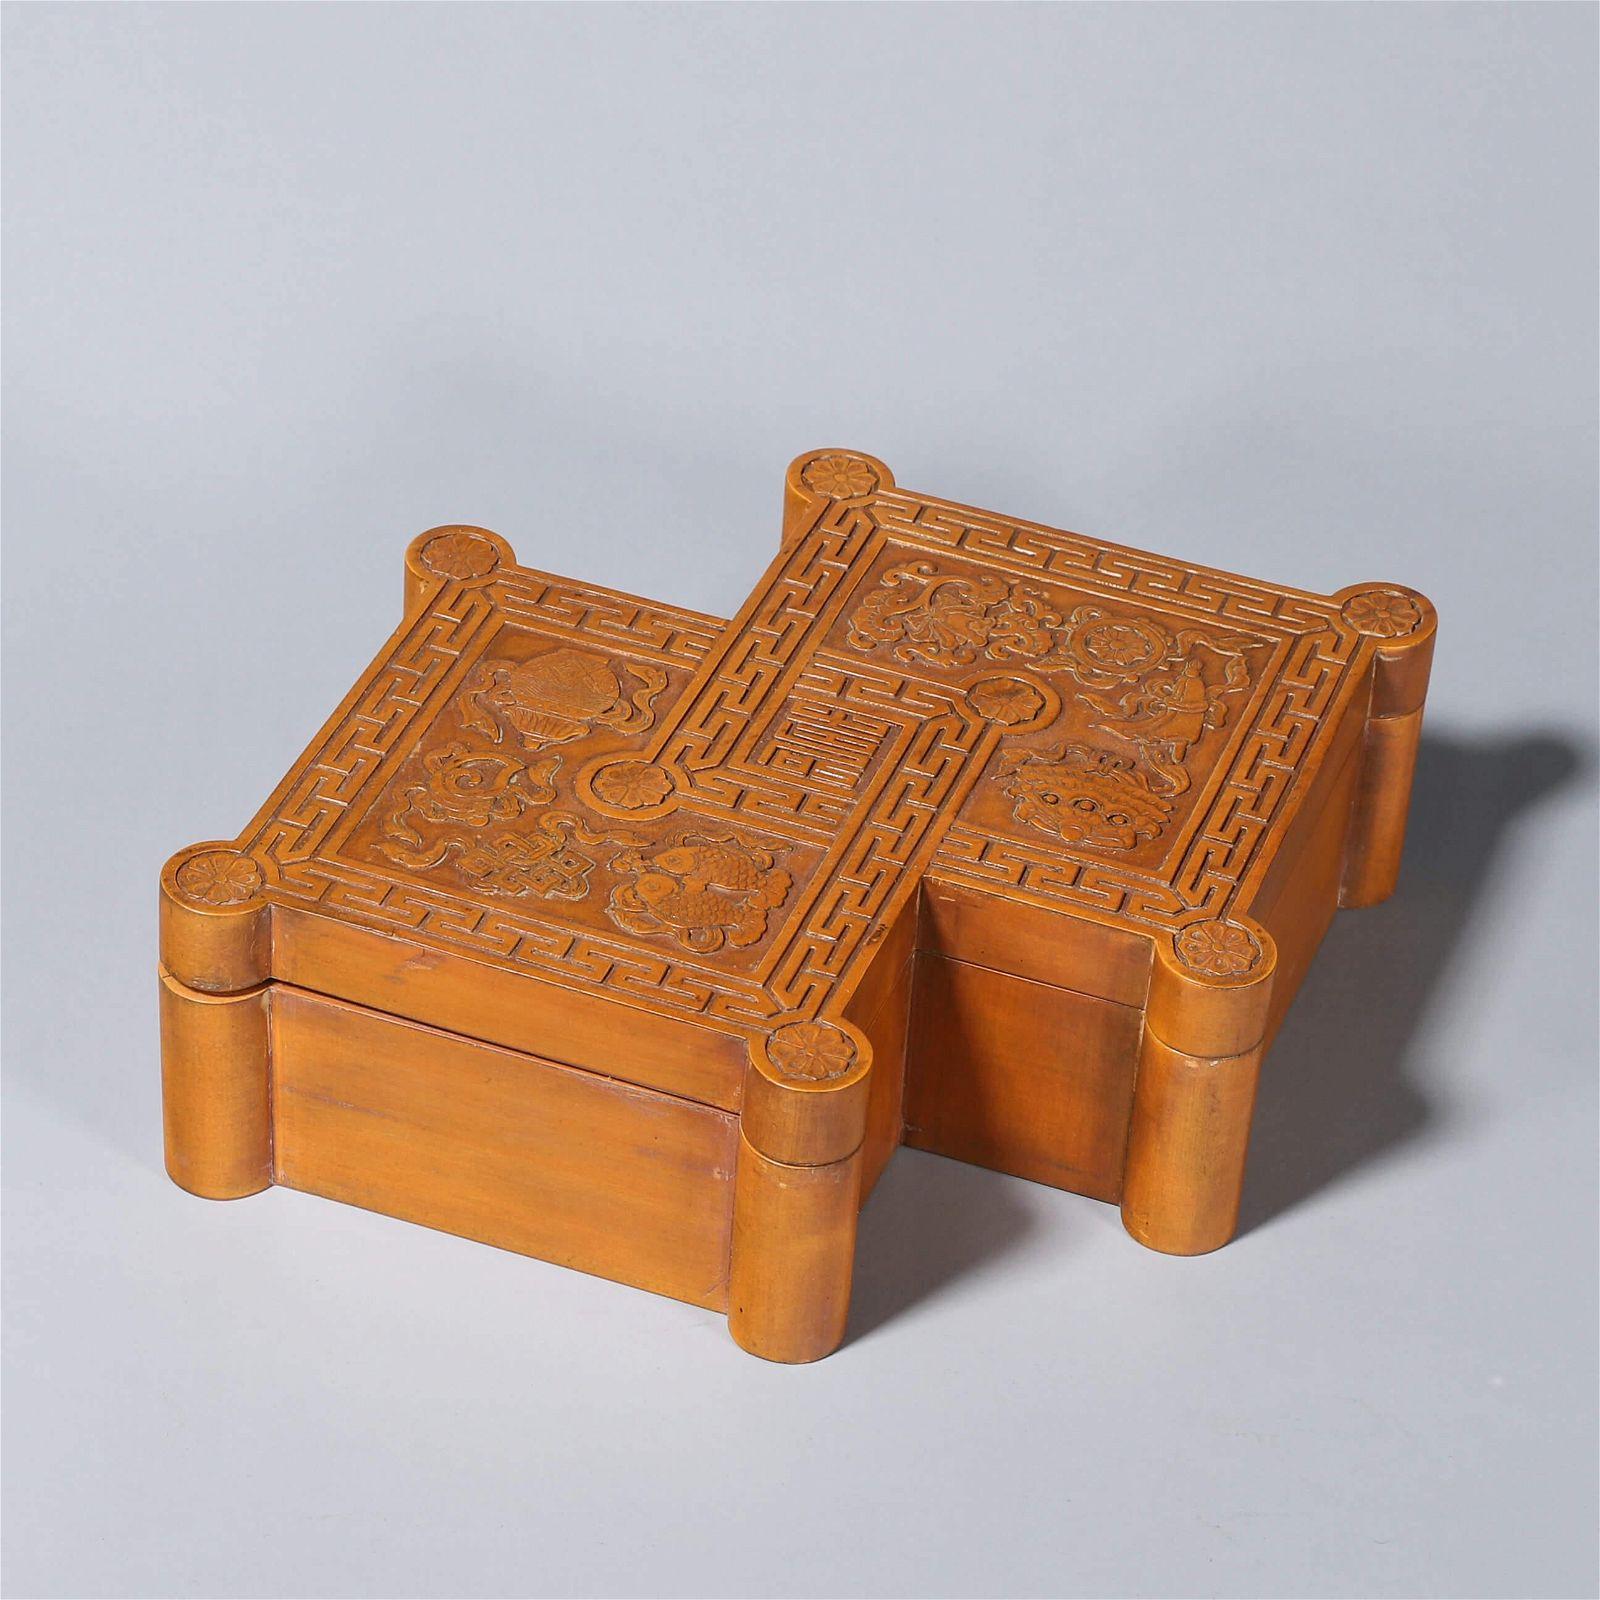 The eight-treasure pattern bamboo box